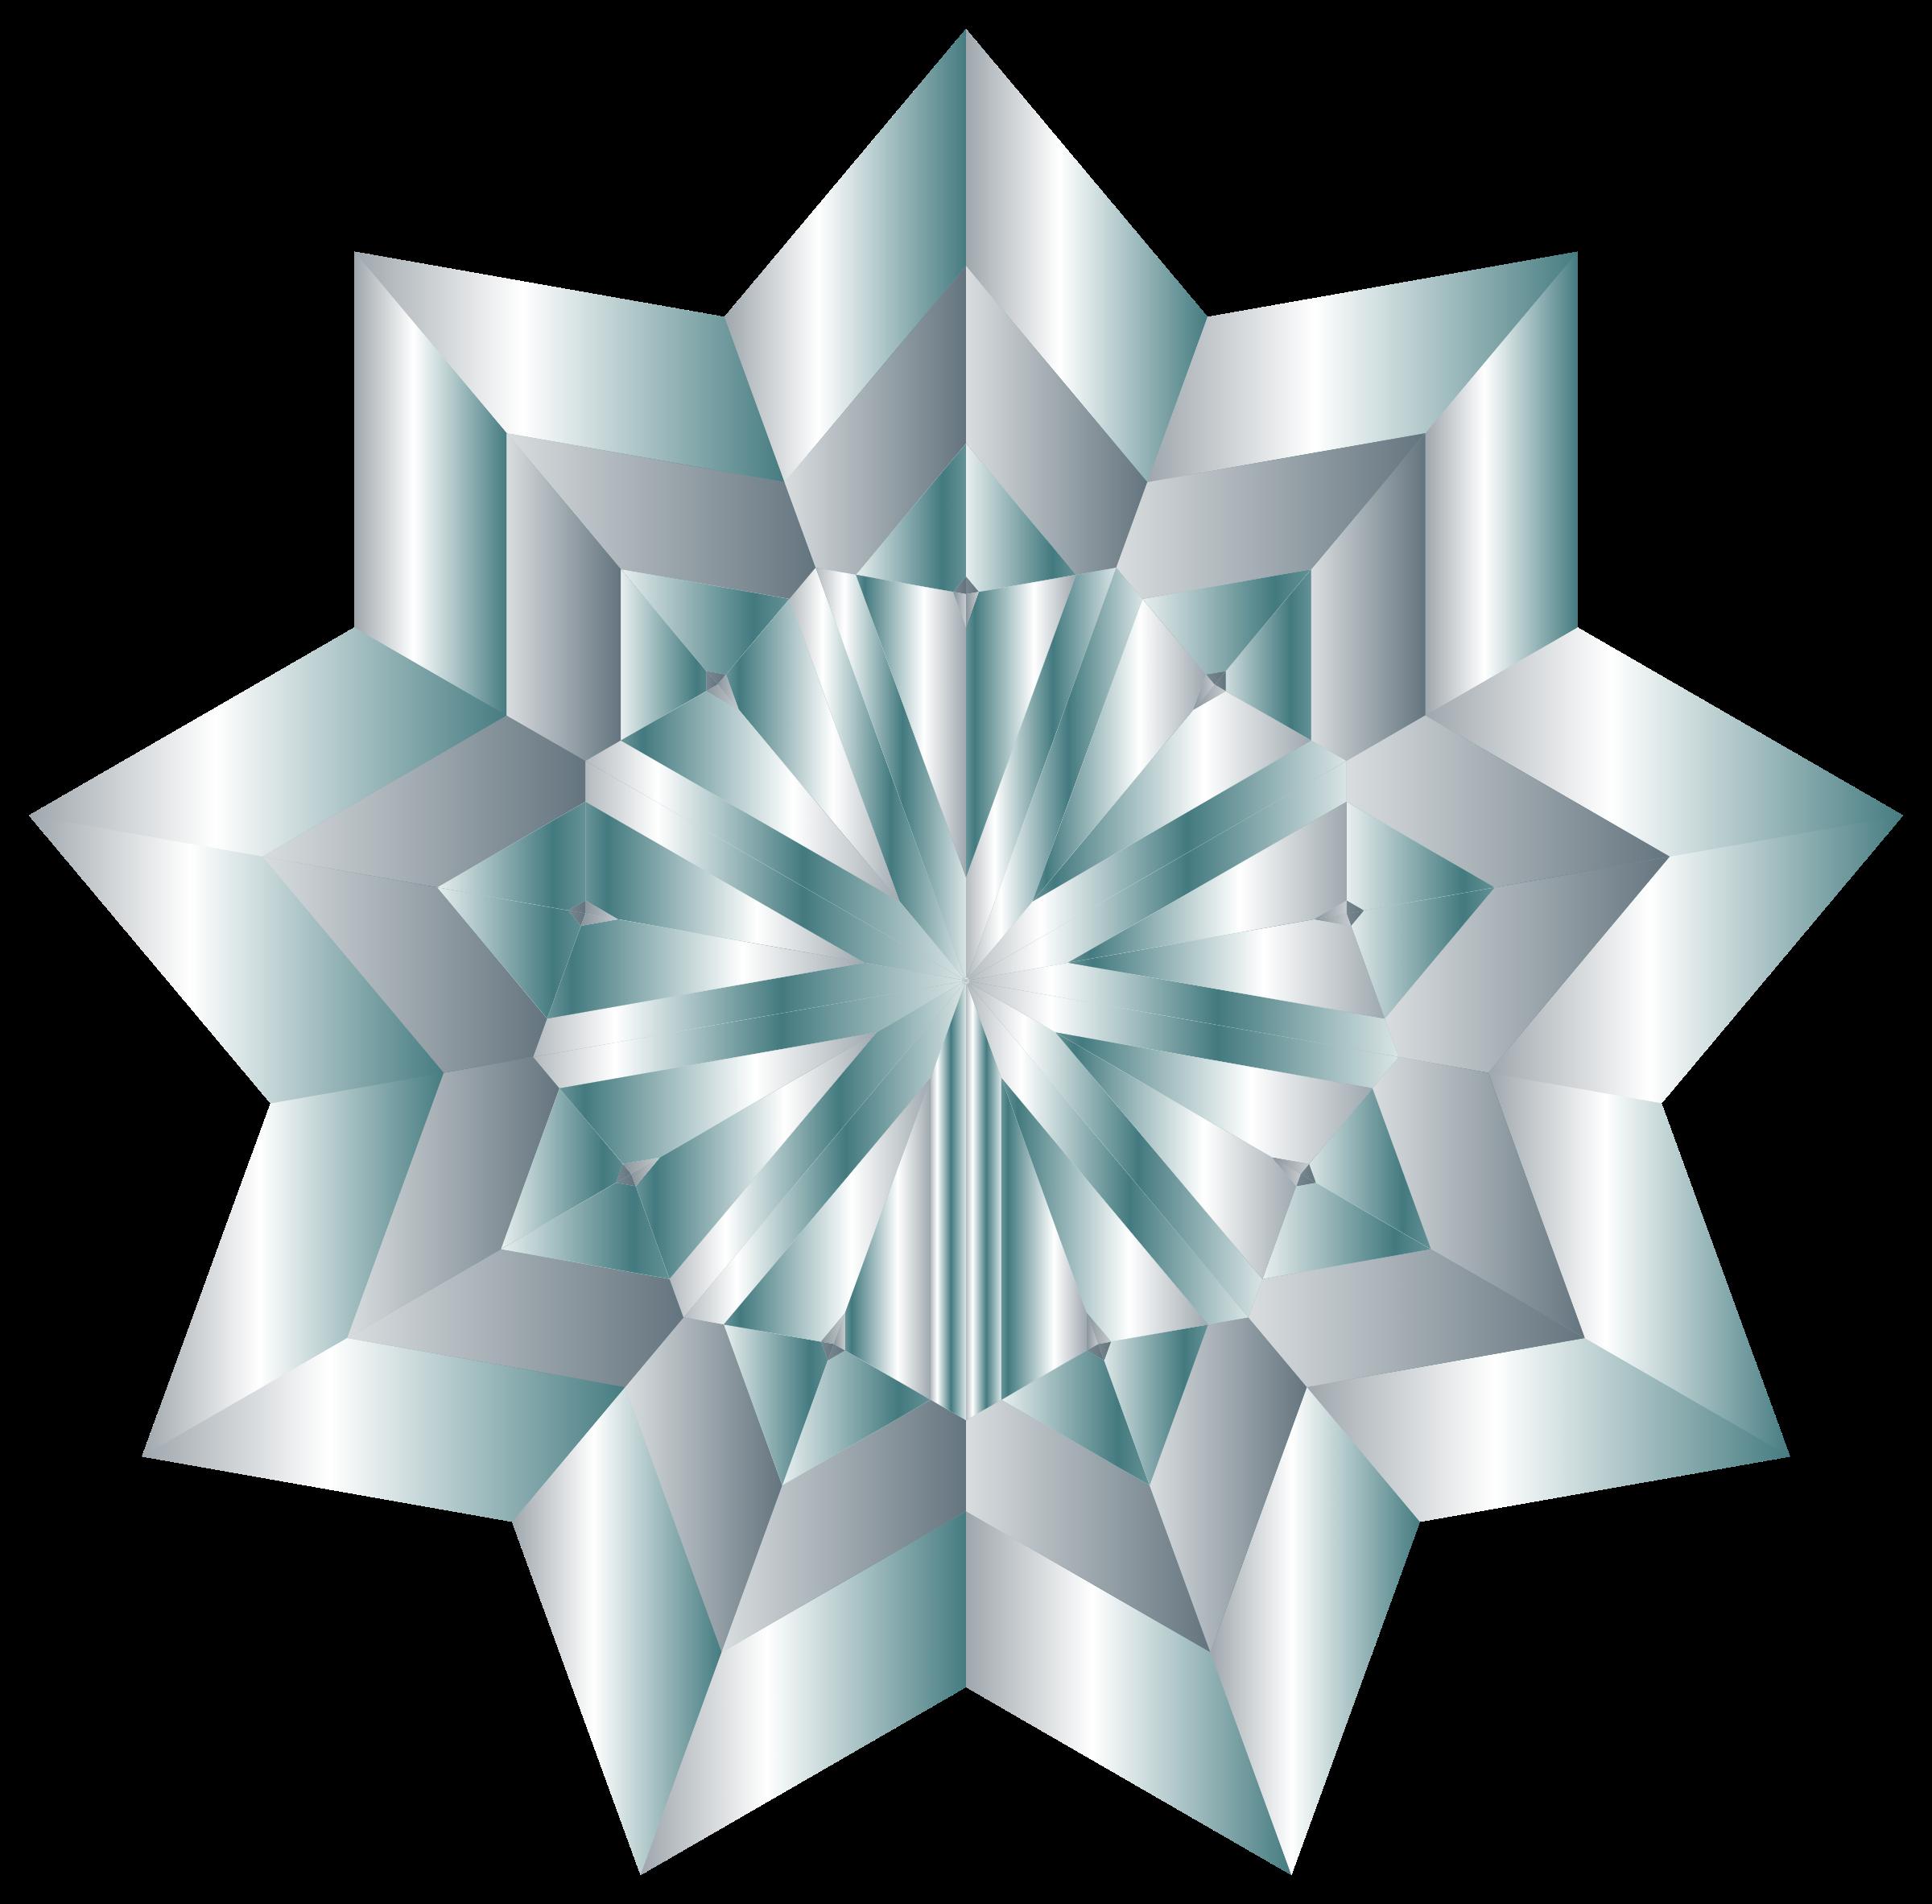 Star big image png. Diamond clipart teal